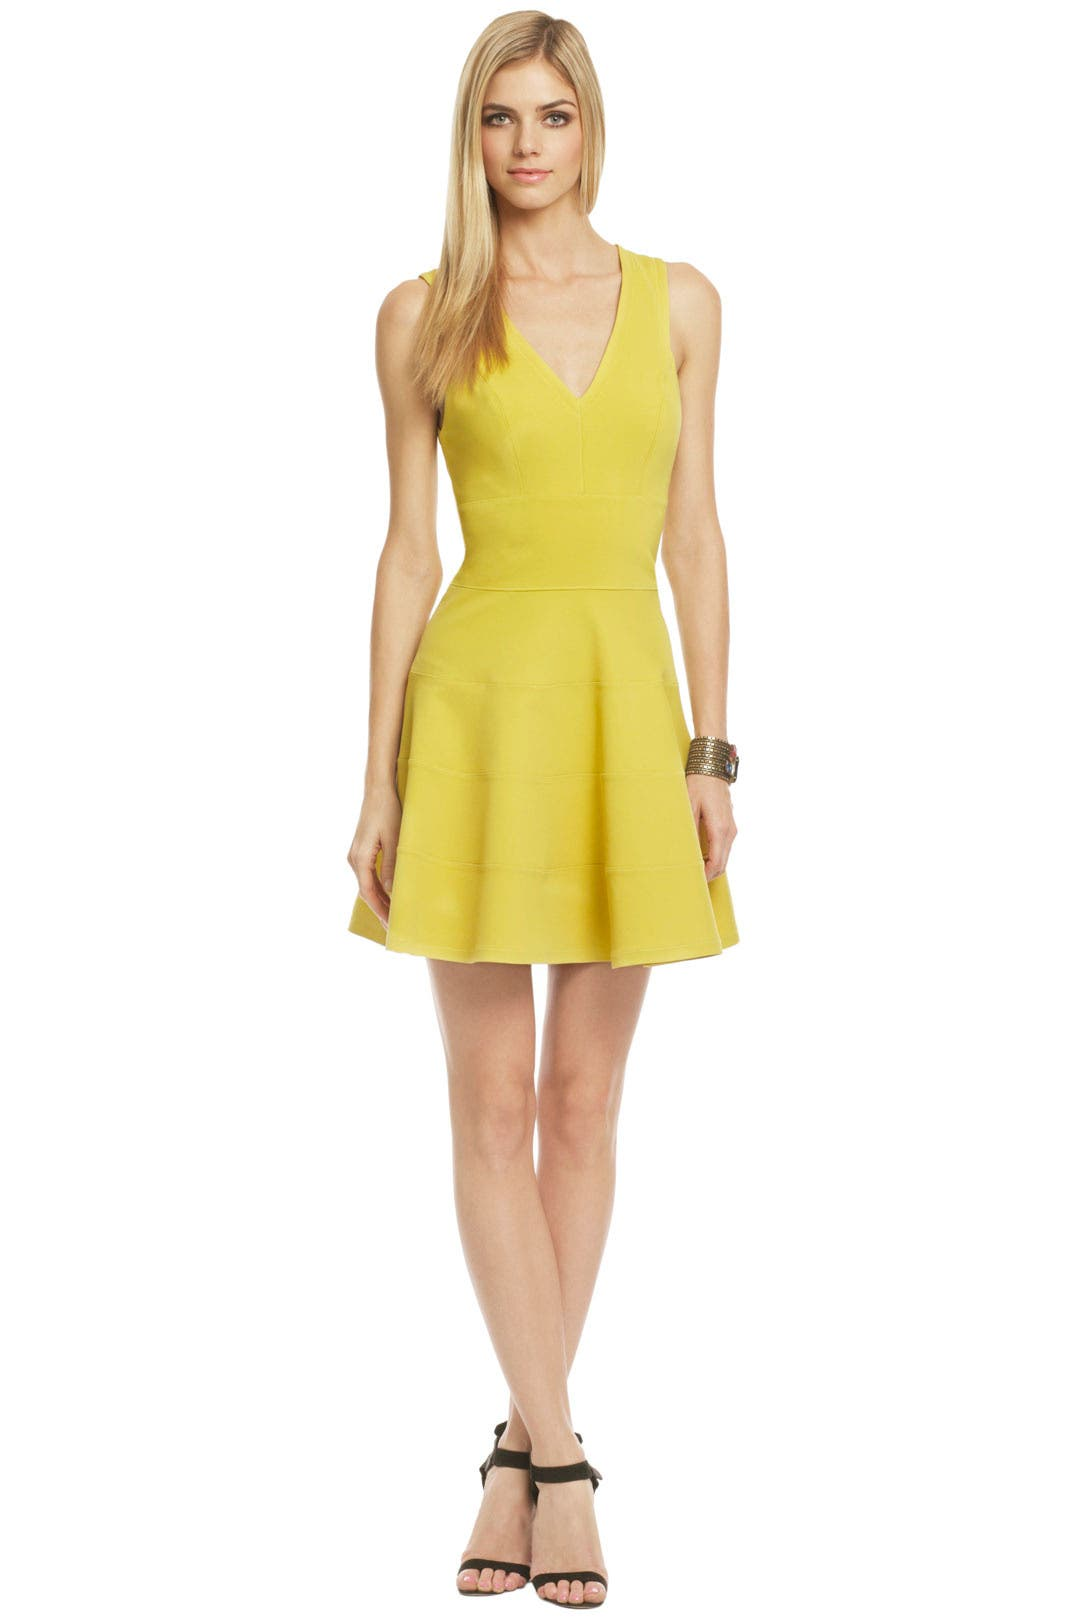 Sour Lemonade Dress by Robert Rodriguez Collection